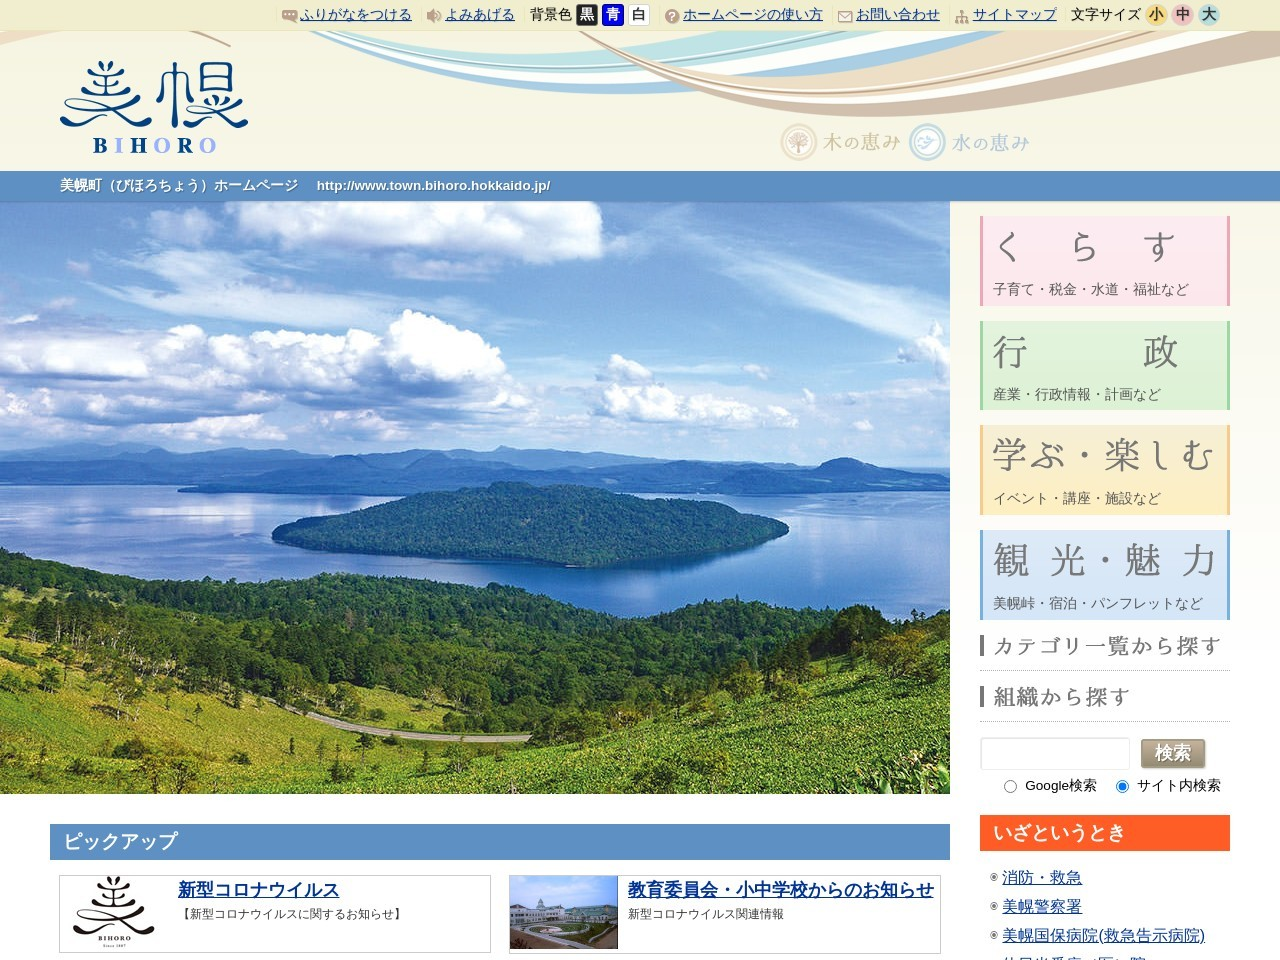 http://www.town.bihoro.hokkaido.jp/docs/2018112700020/